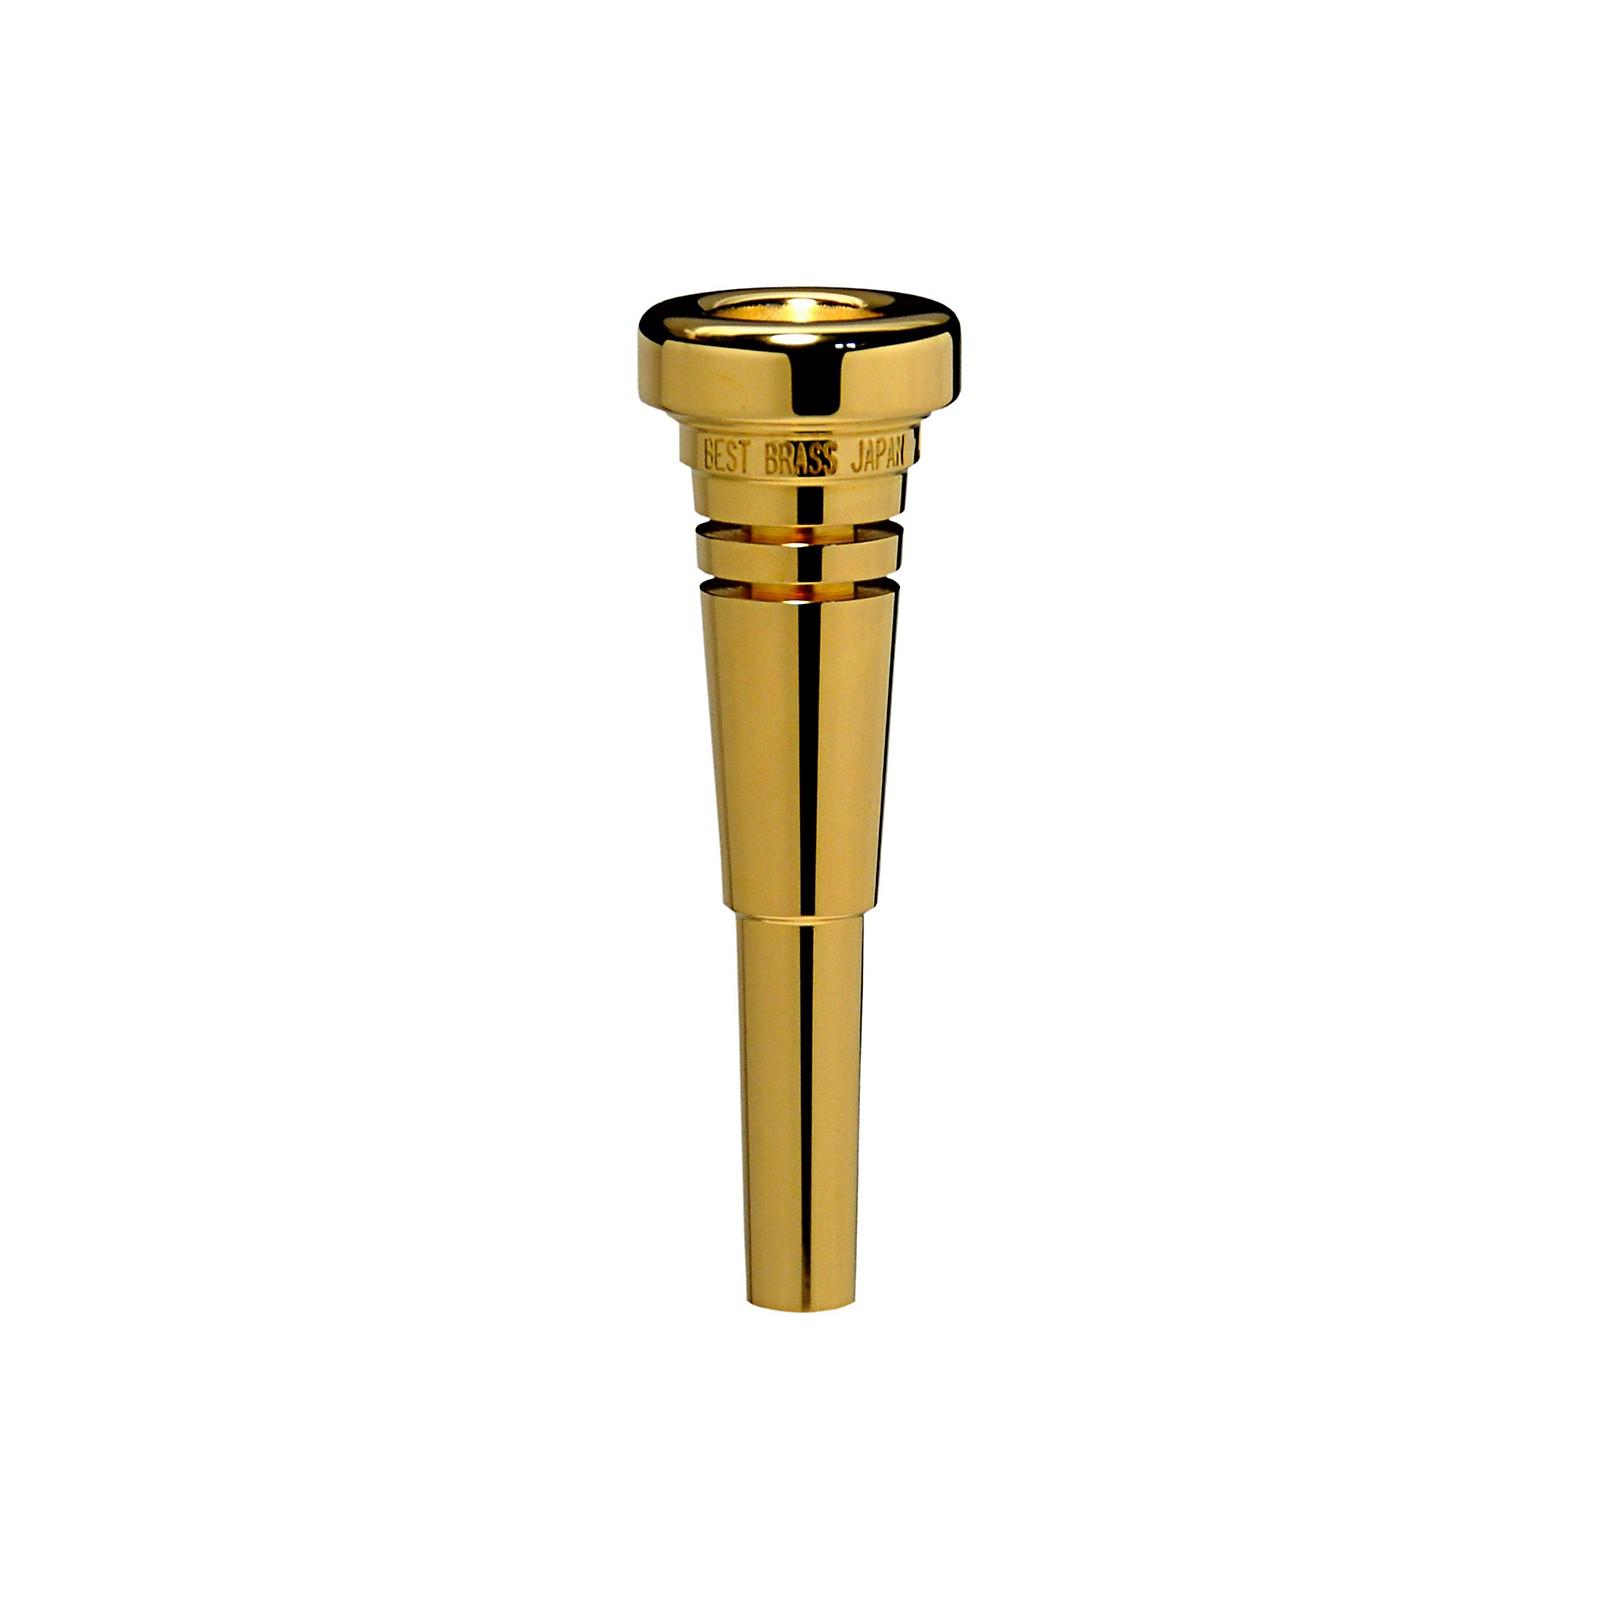 Best Brass TP-3X Groove Series Trumpet Mouthpiece